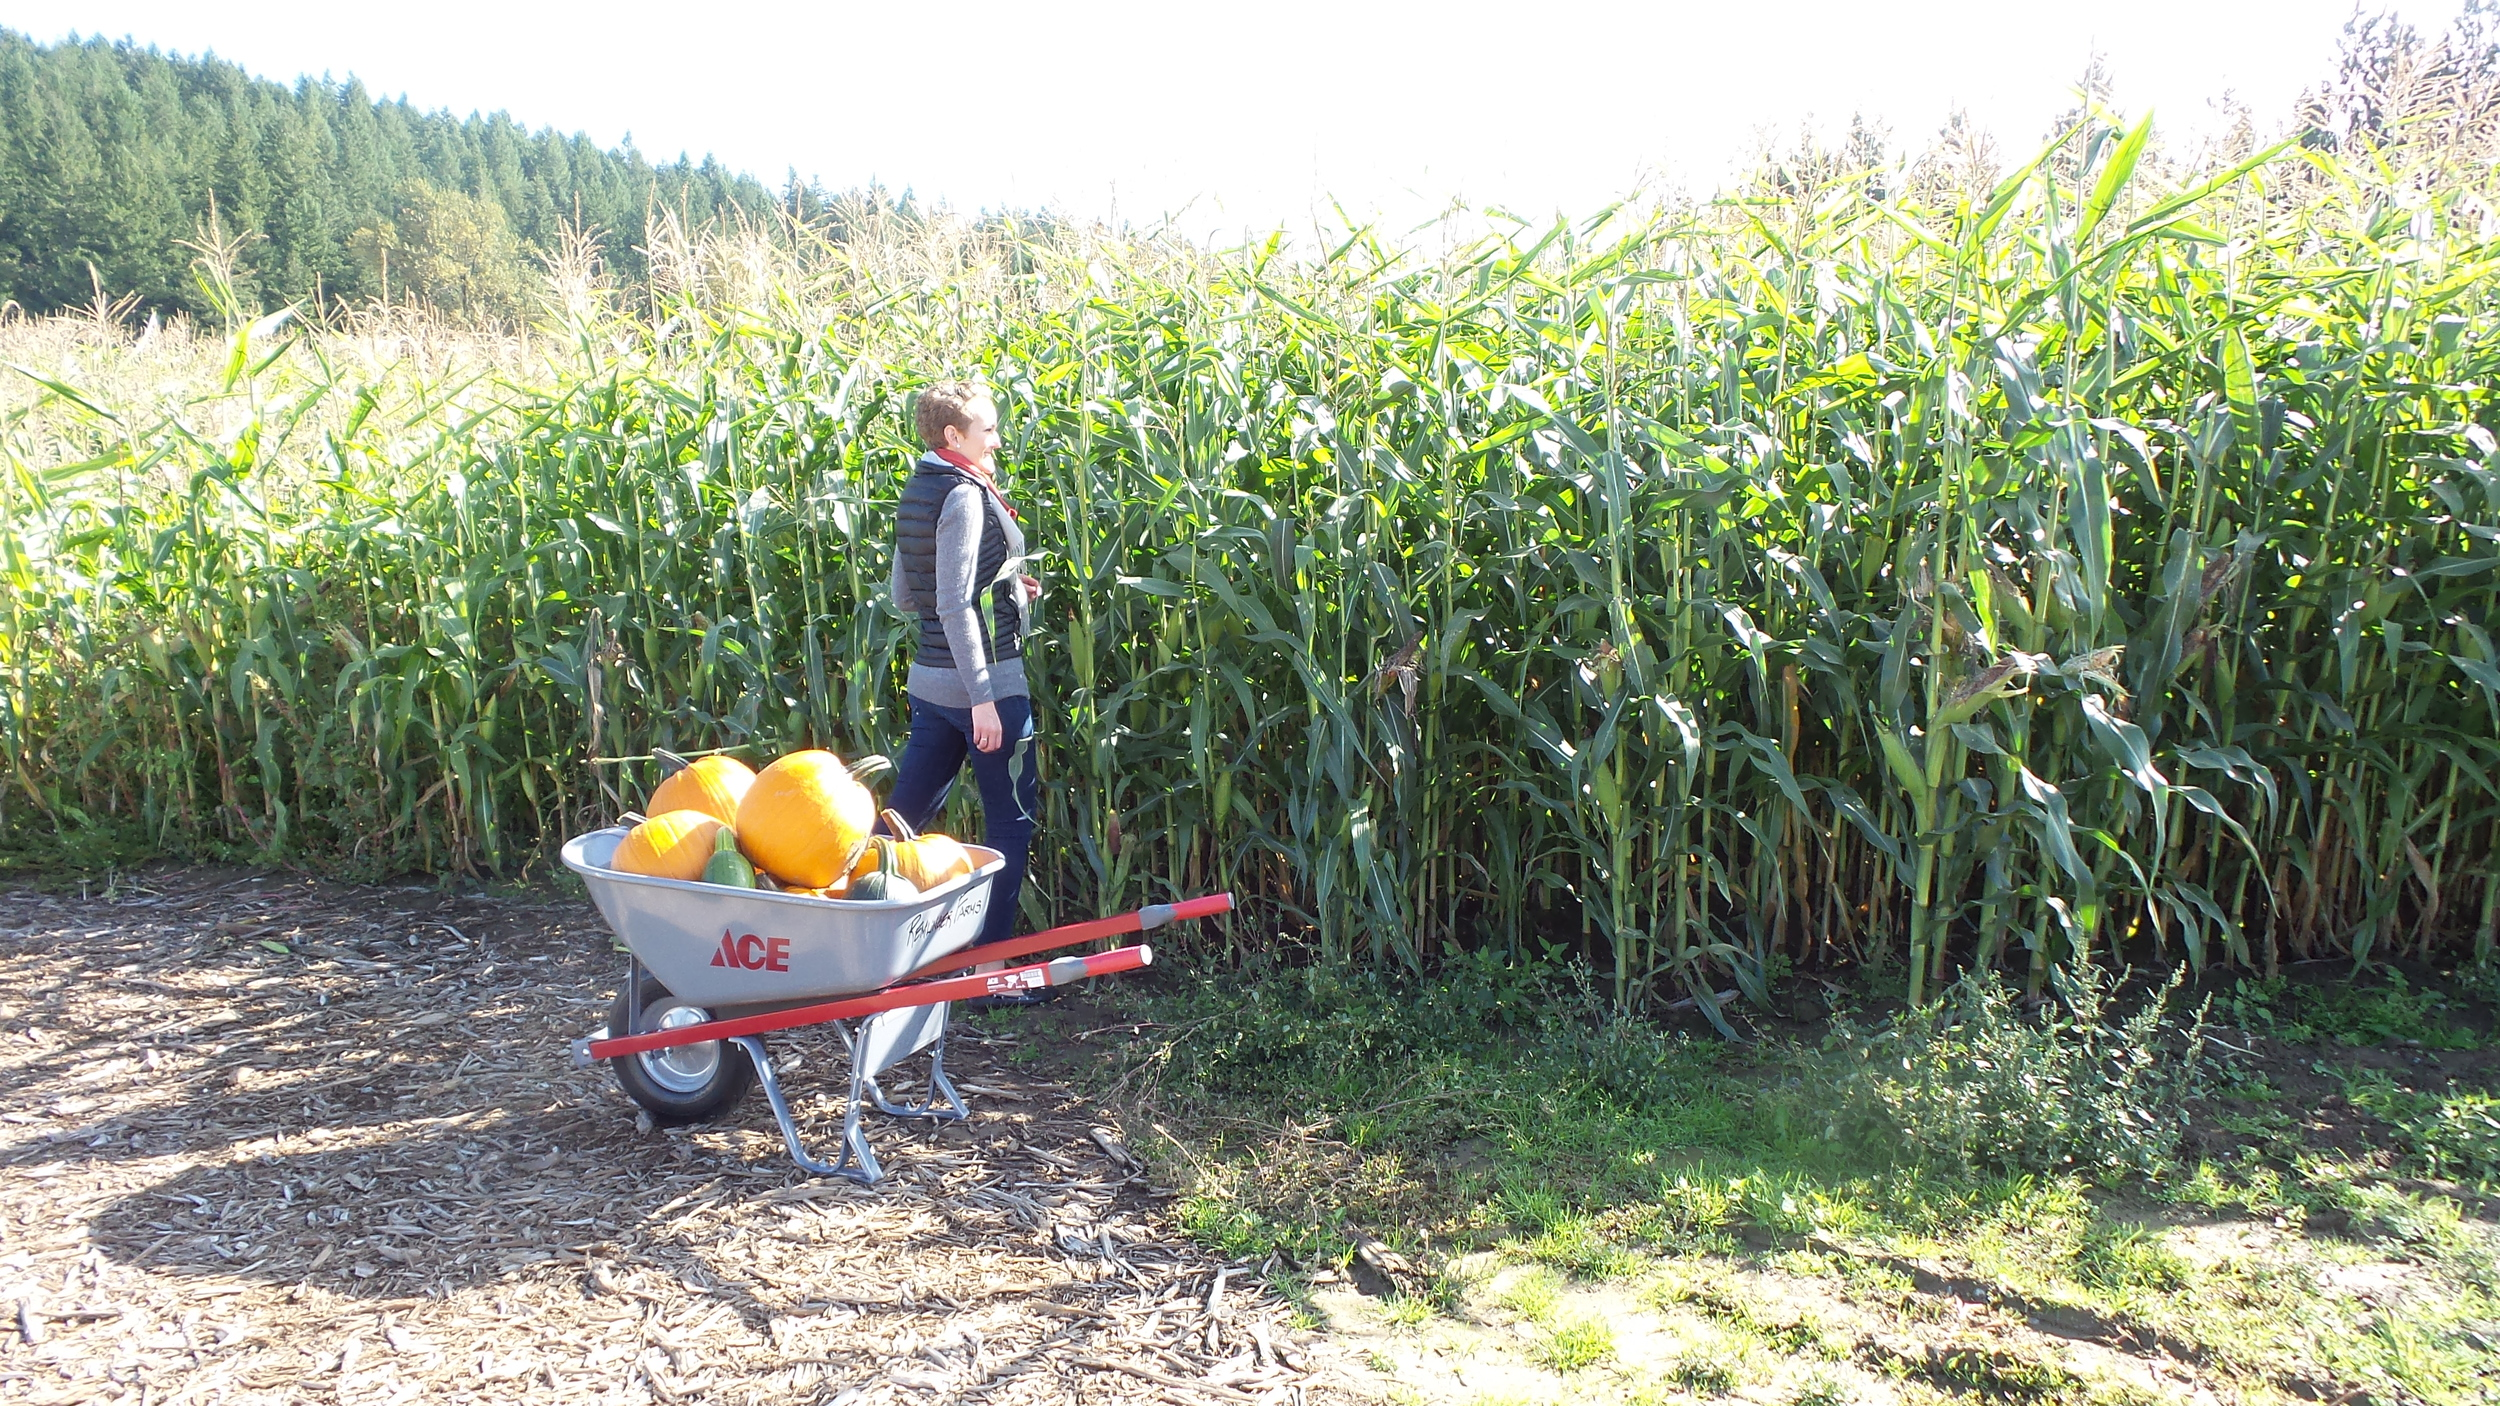 U-pick pumpkins at Remlinger Farms in Carnation, Washington